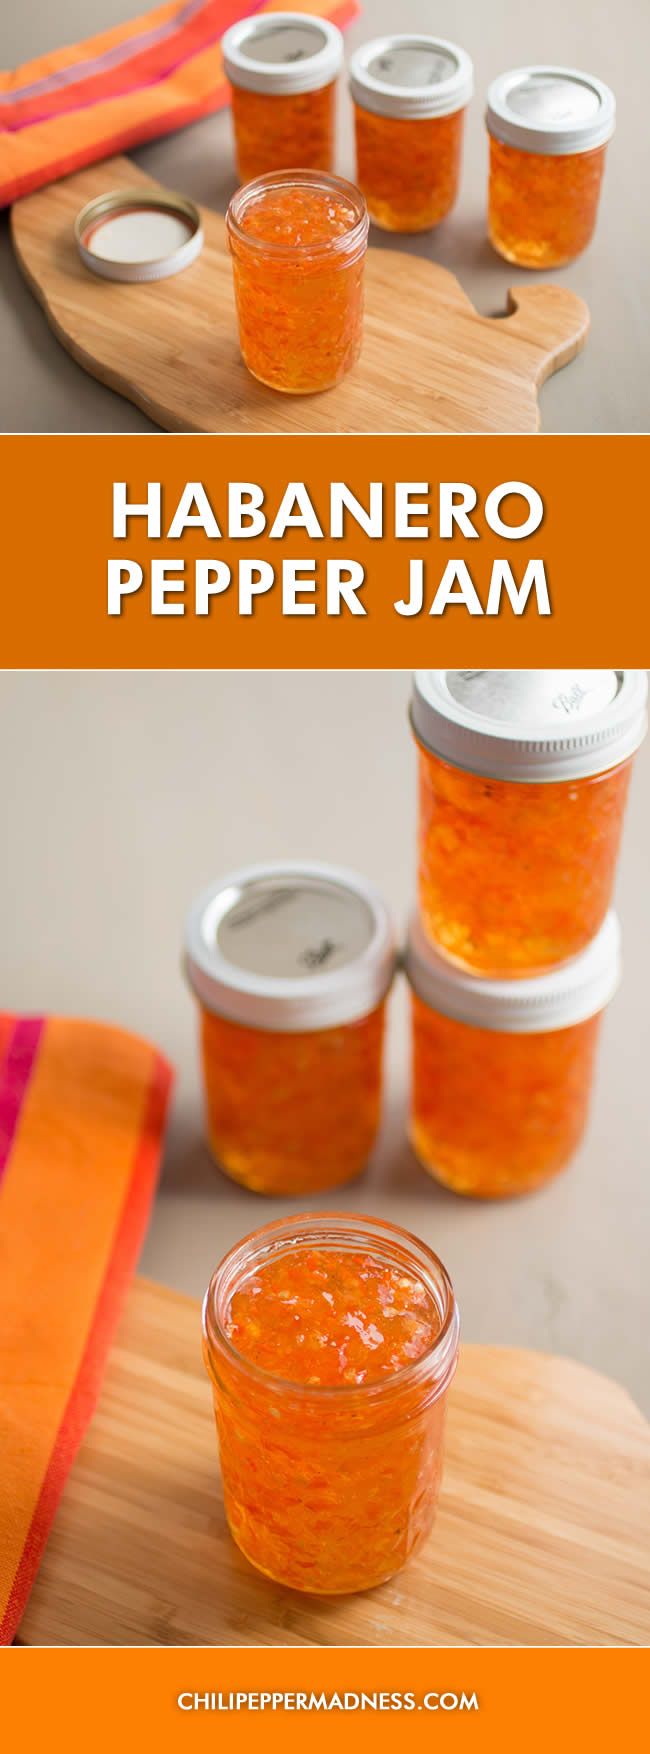 Habanero Pepper Jam - Recipe | ChiliPepperMadness.com